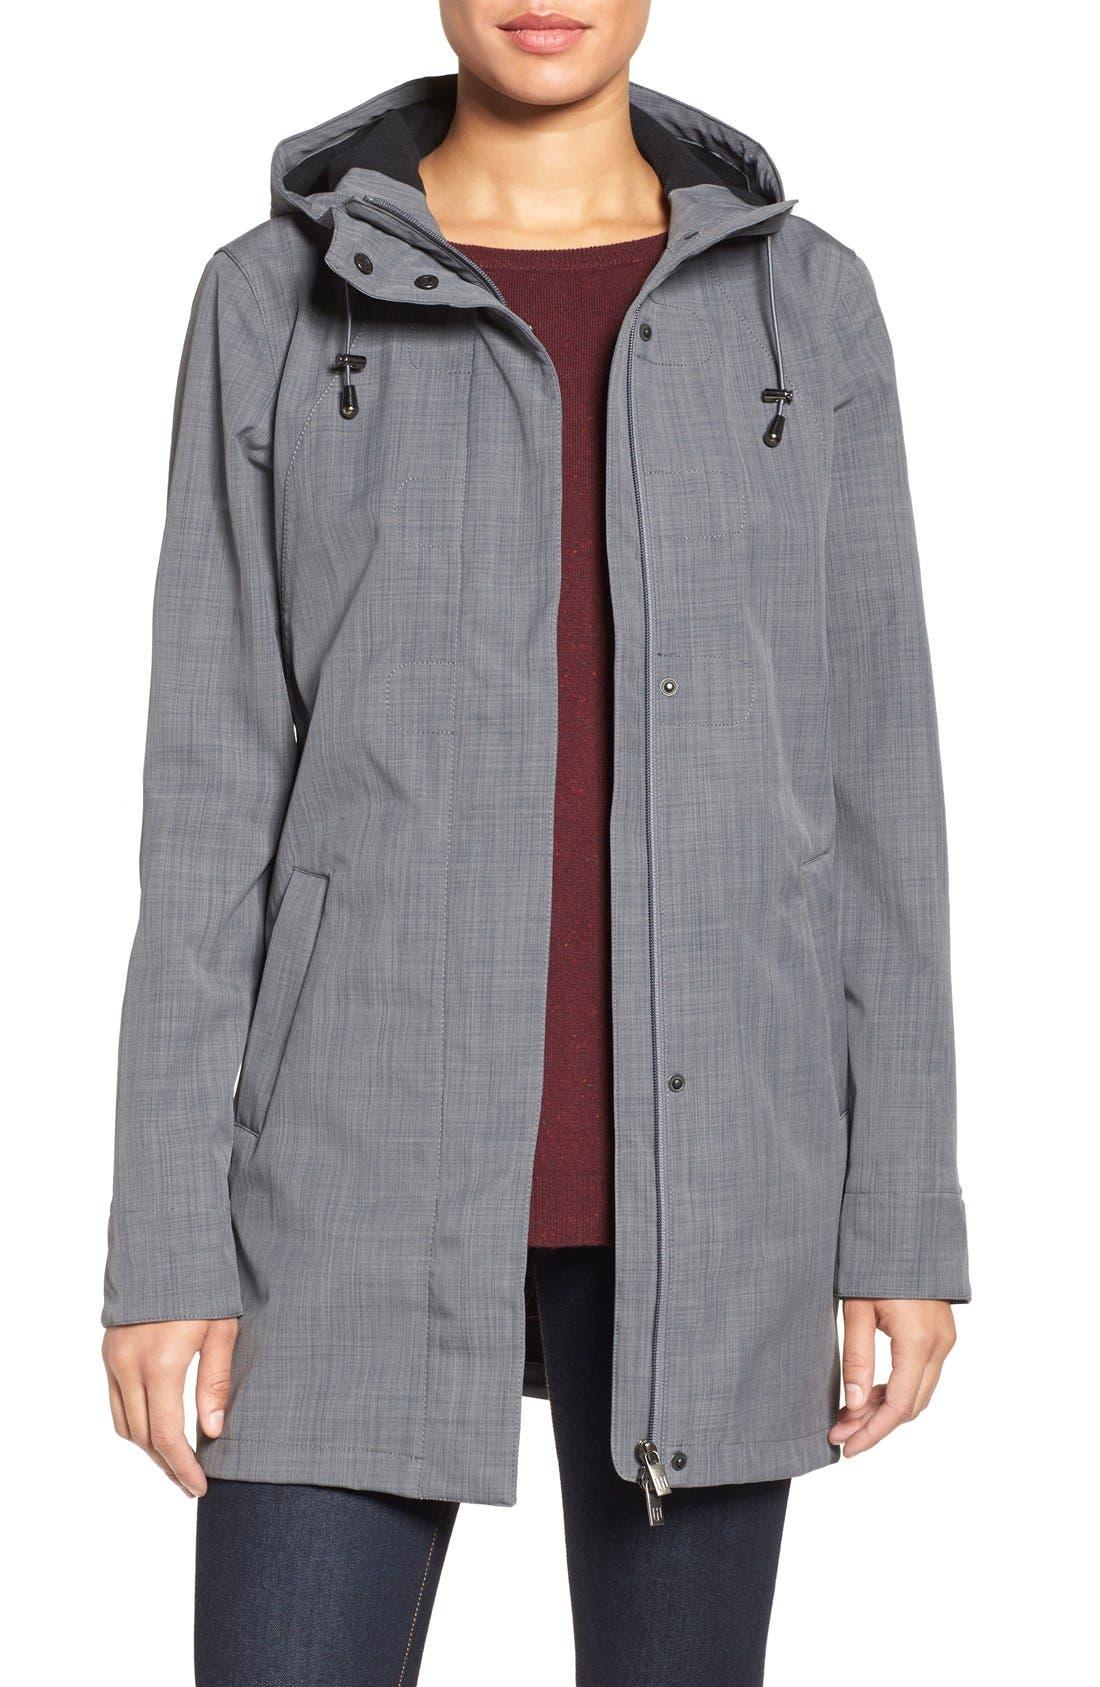 Alternate Image 1 Selected - Ilse Jacobsen Hooded Raincoat